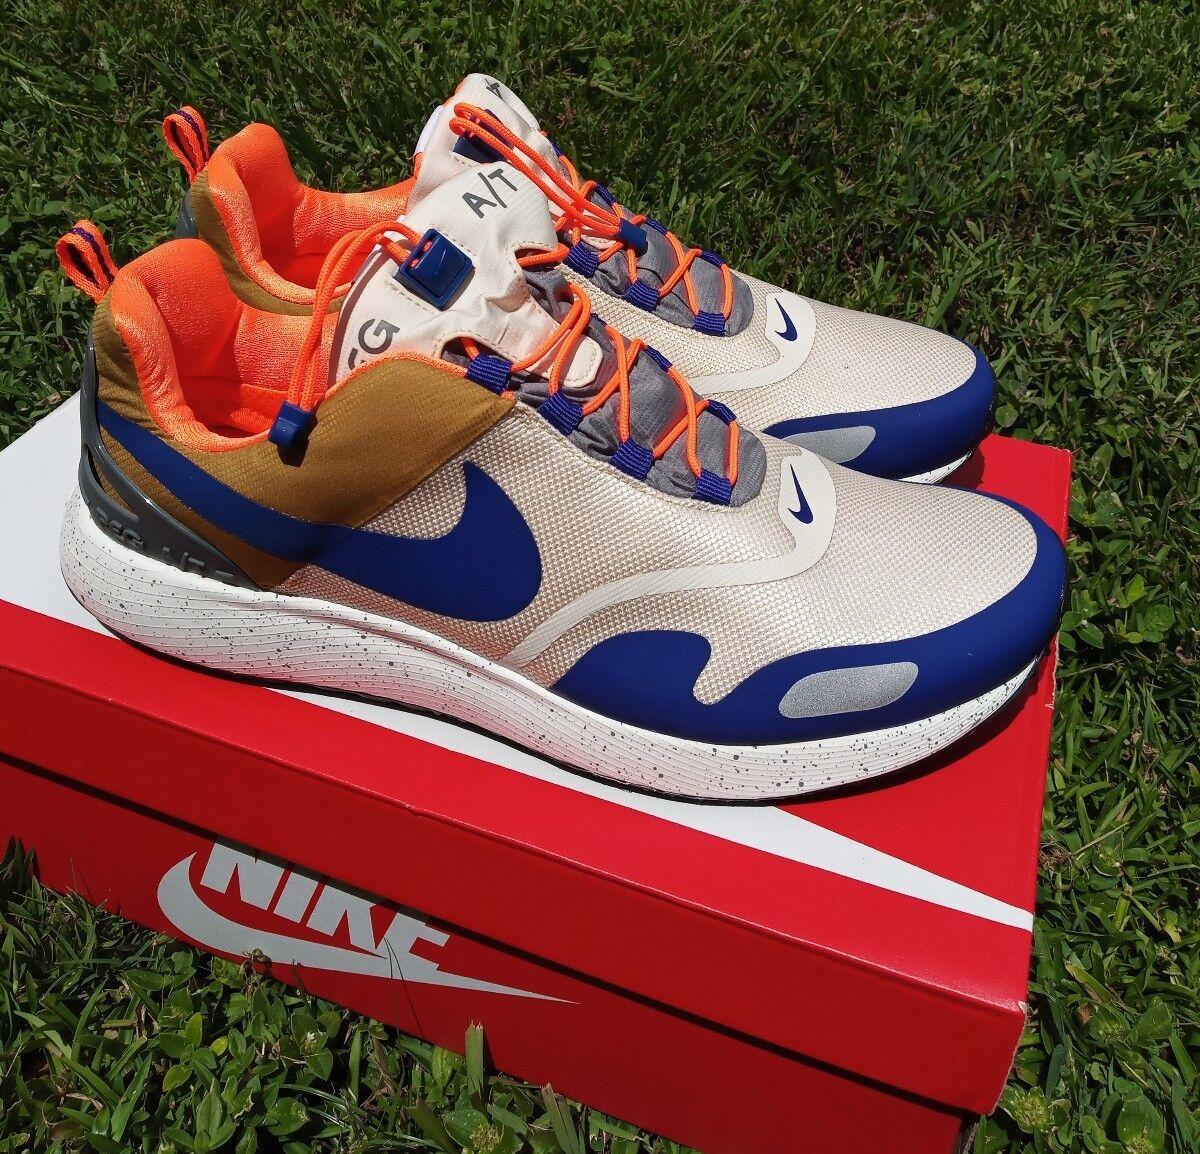 11 Nike Air Pegasus A T Winter QS Cream Concord AO3296 200 BEIGE MULTICOLOR